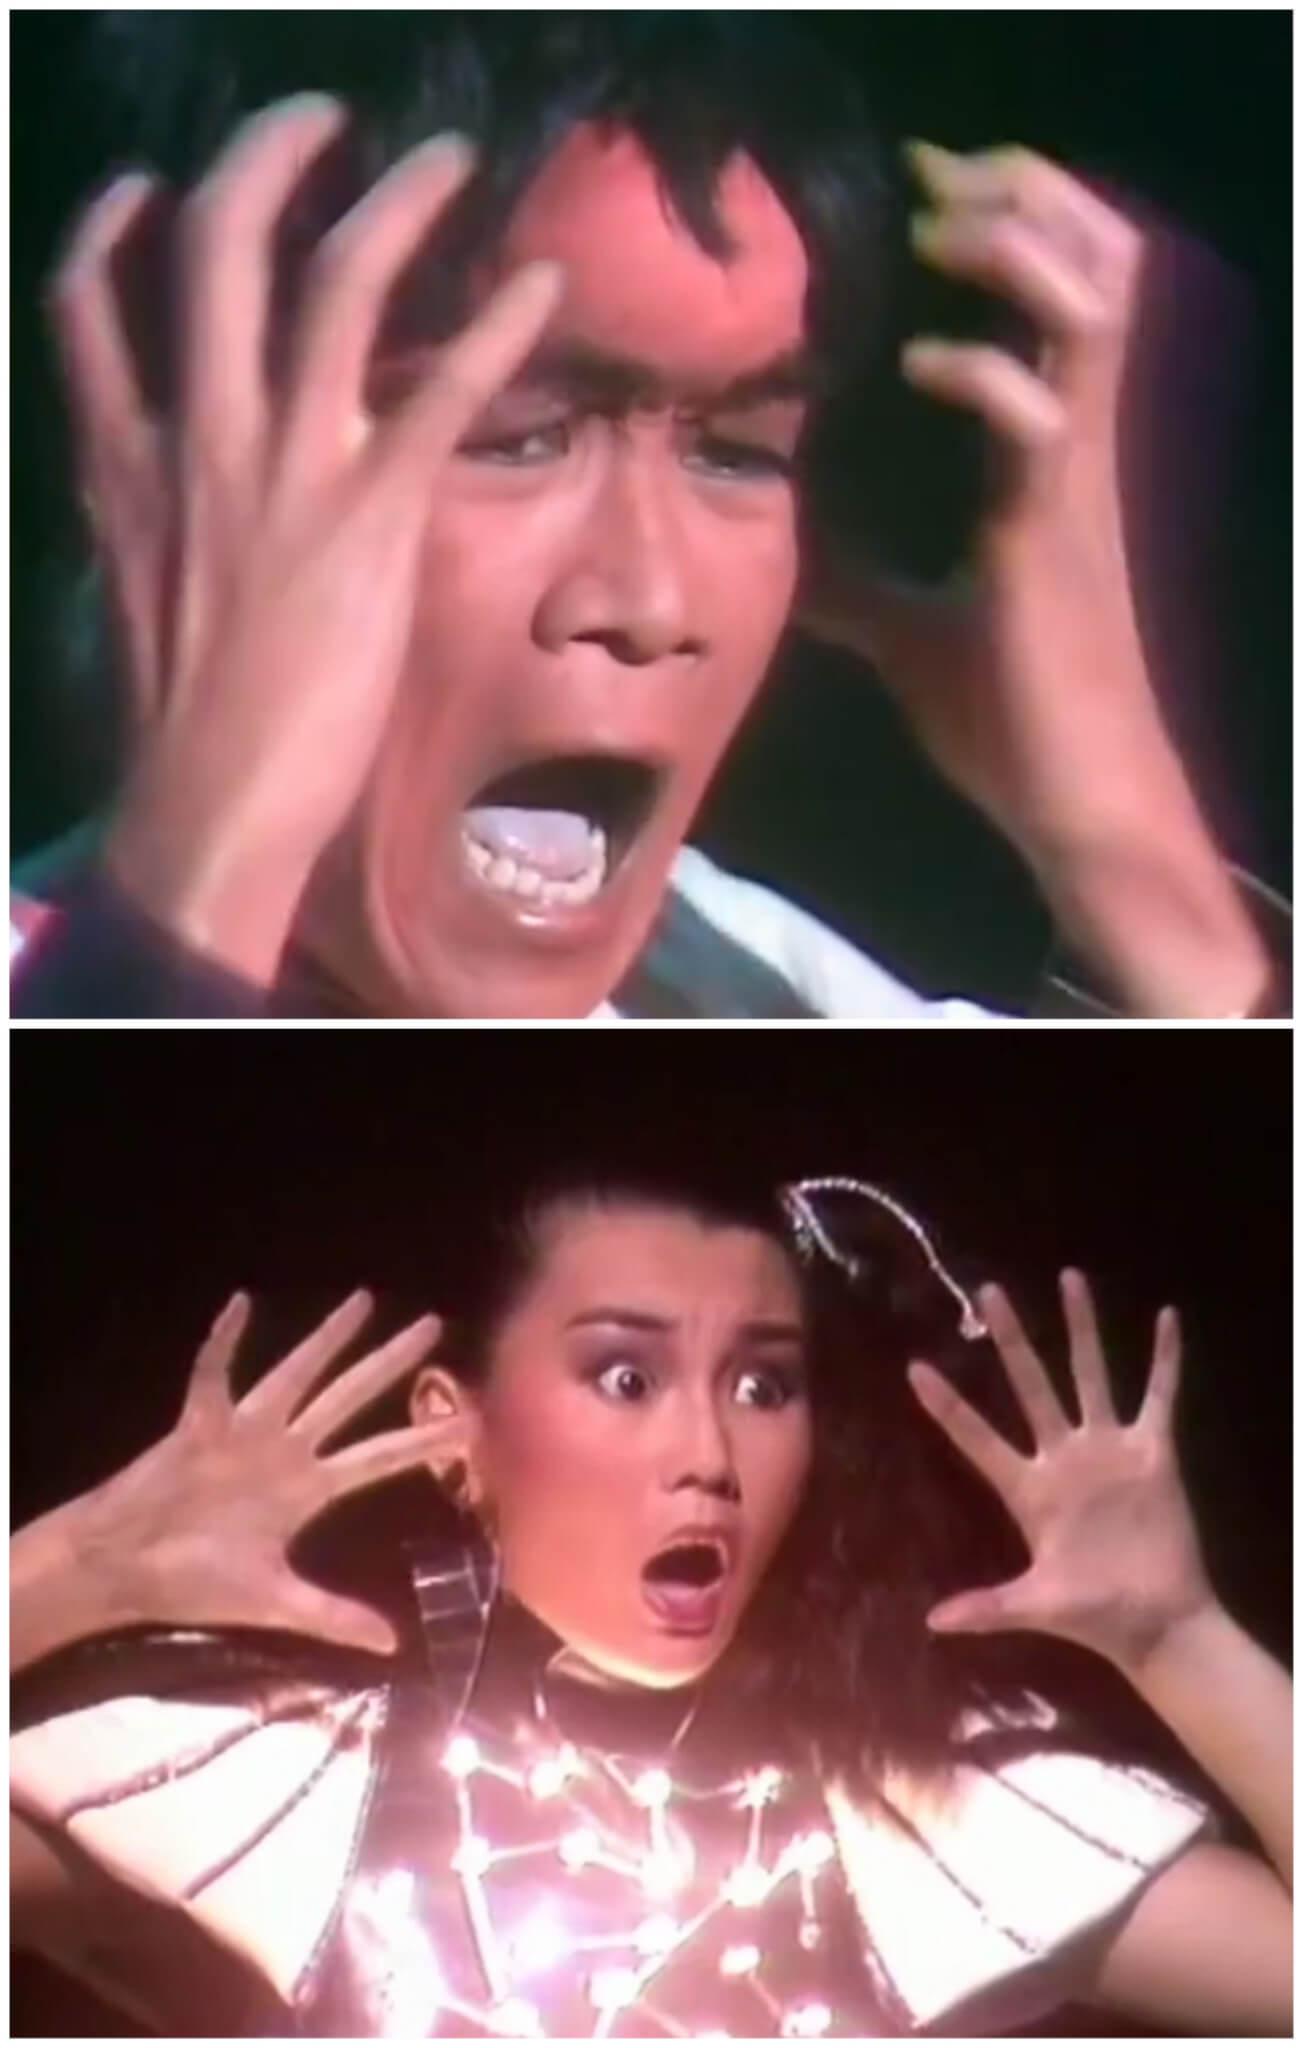 Danny樣貌突變的一幕,Maggie要表現驚慌,觀眾看到官仔骨骨的他變成如斯模樣,也同樣嚇了一大跳。